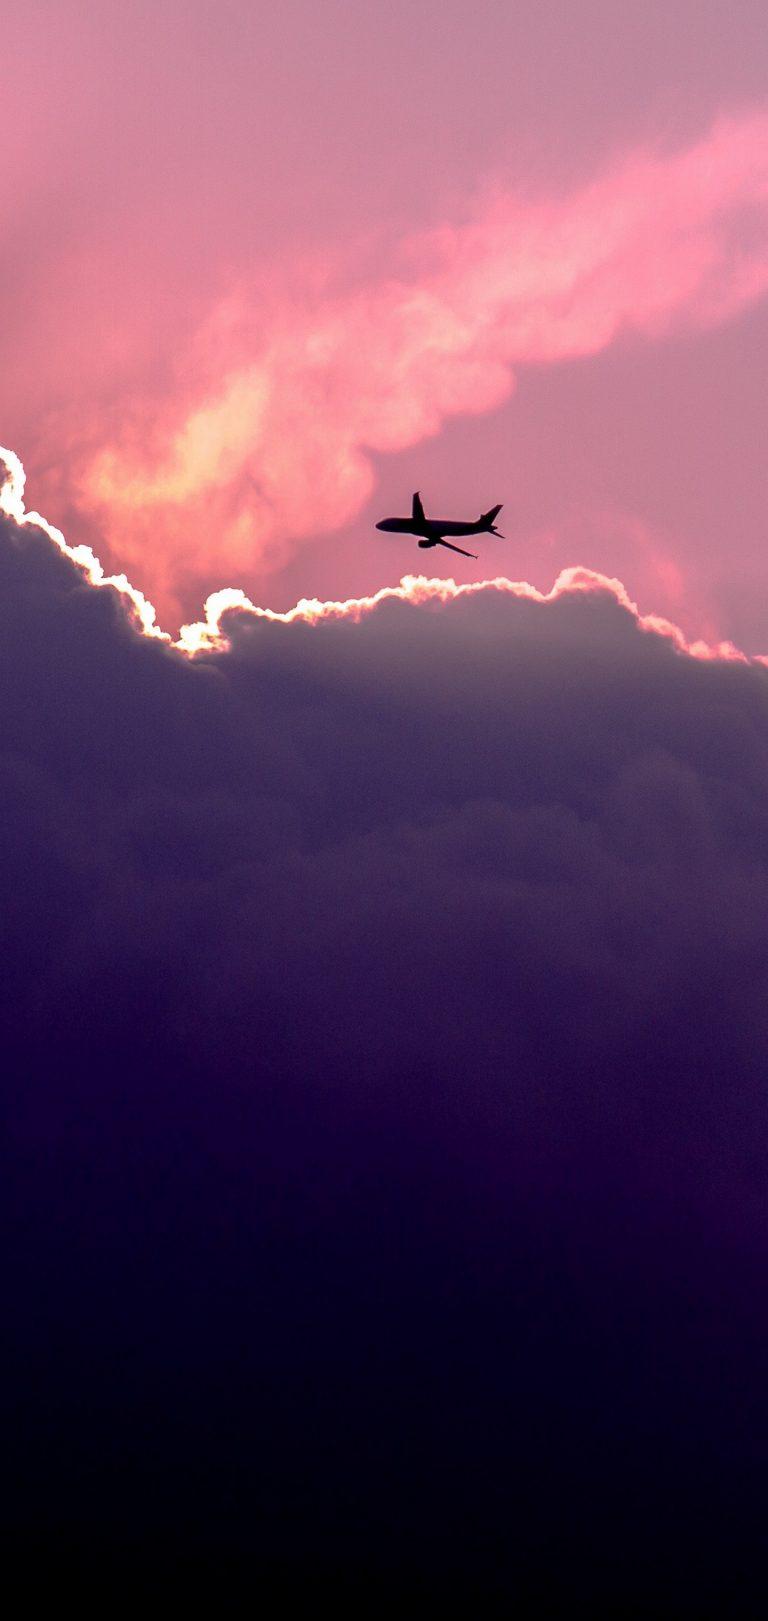 Plane Sky Clouds Wallpaper 1440x3040 768x1621